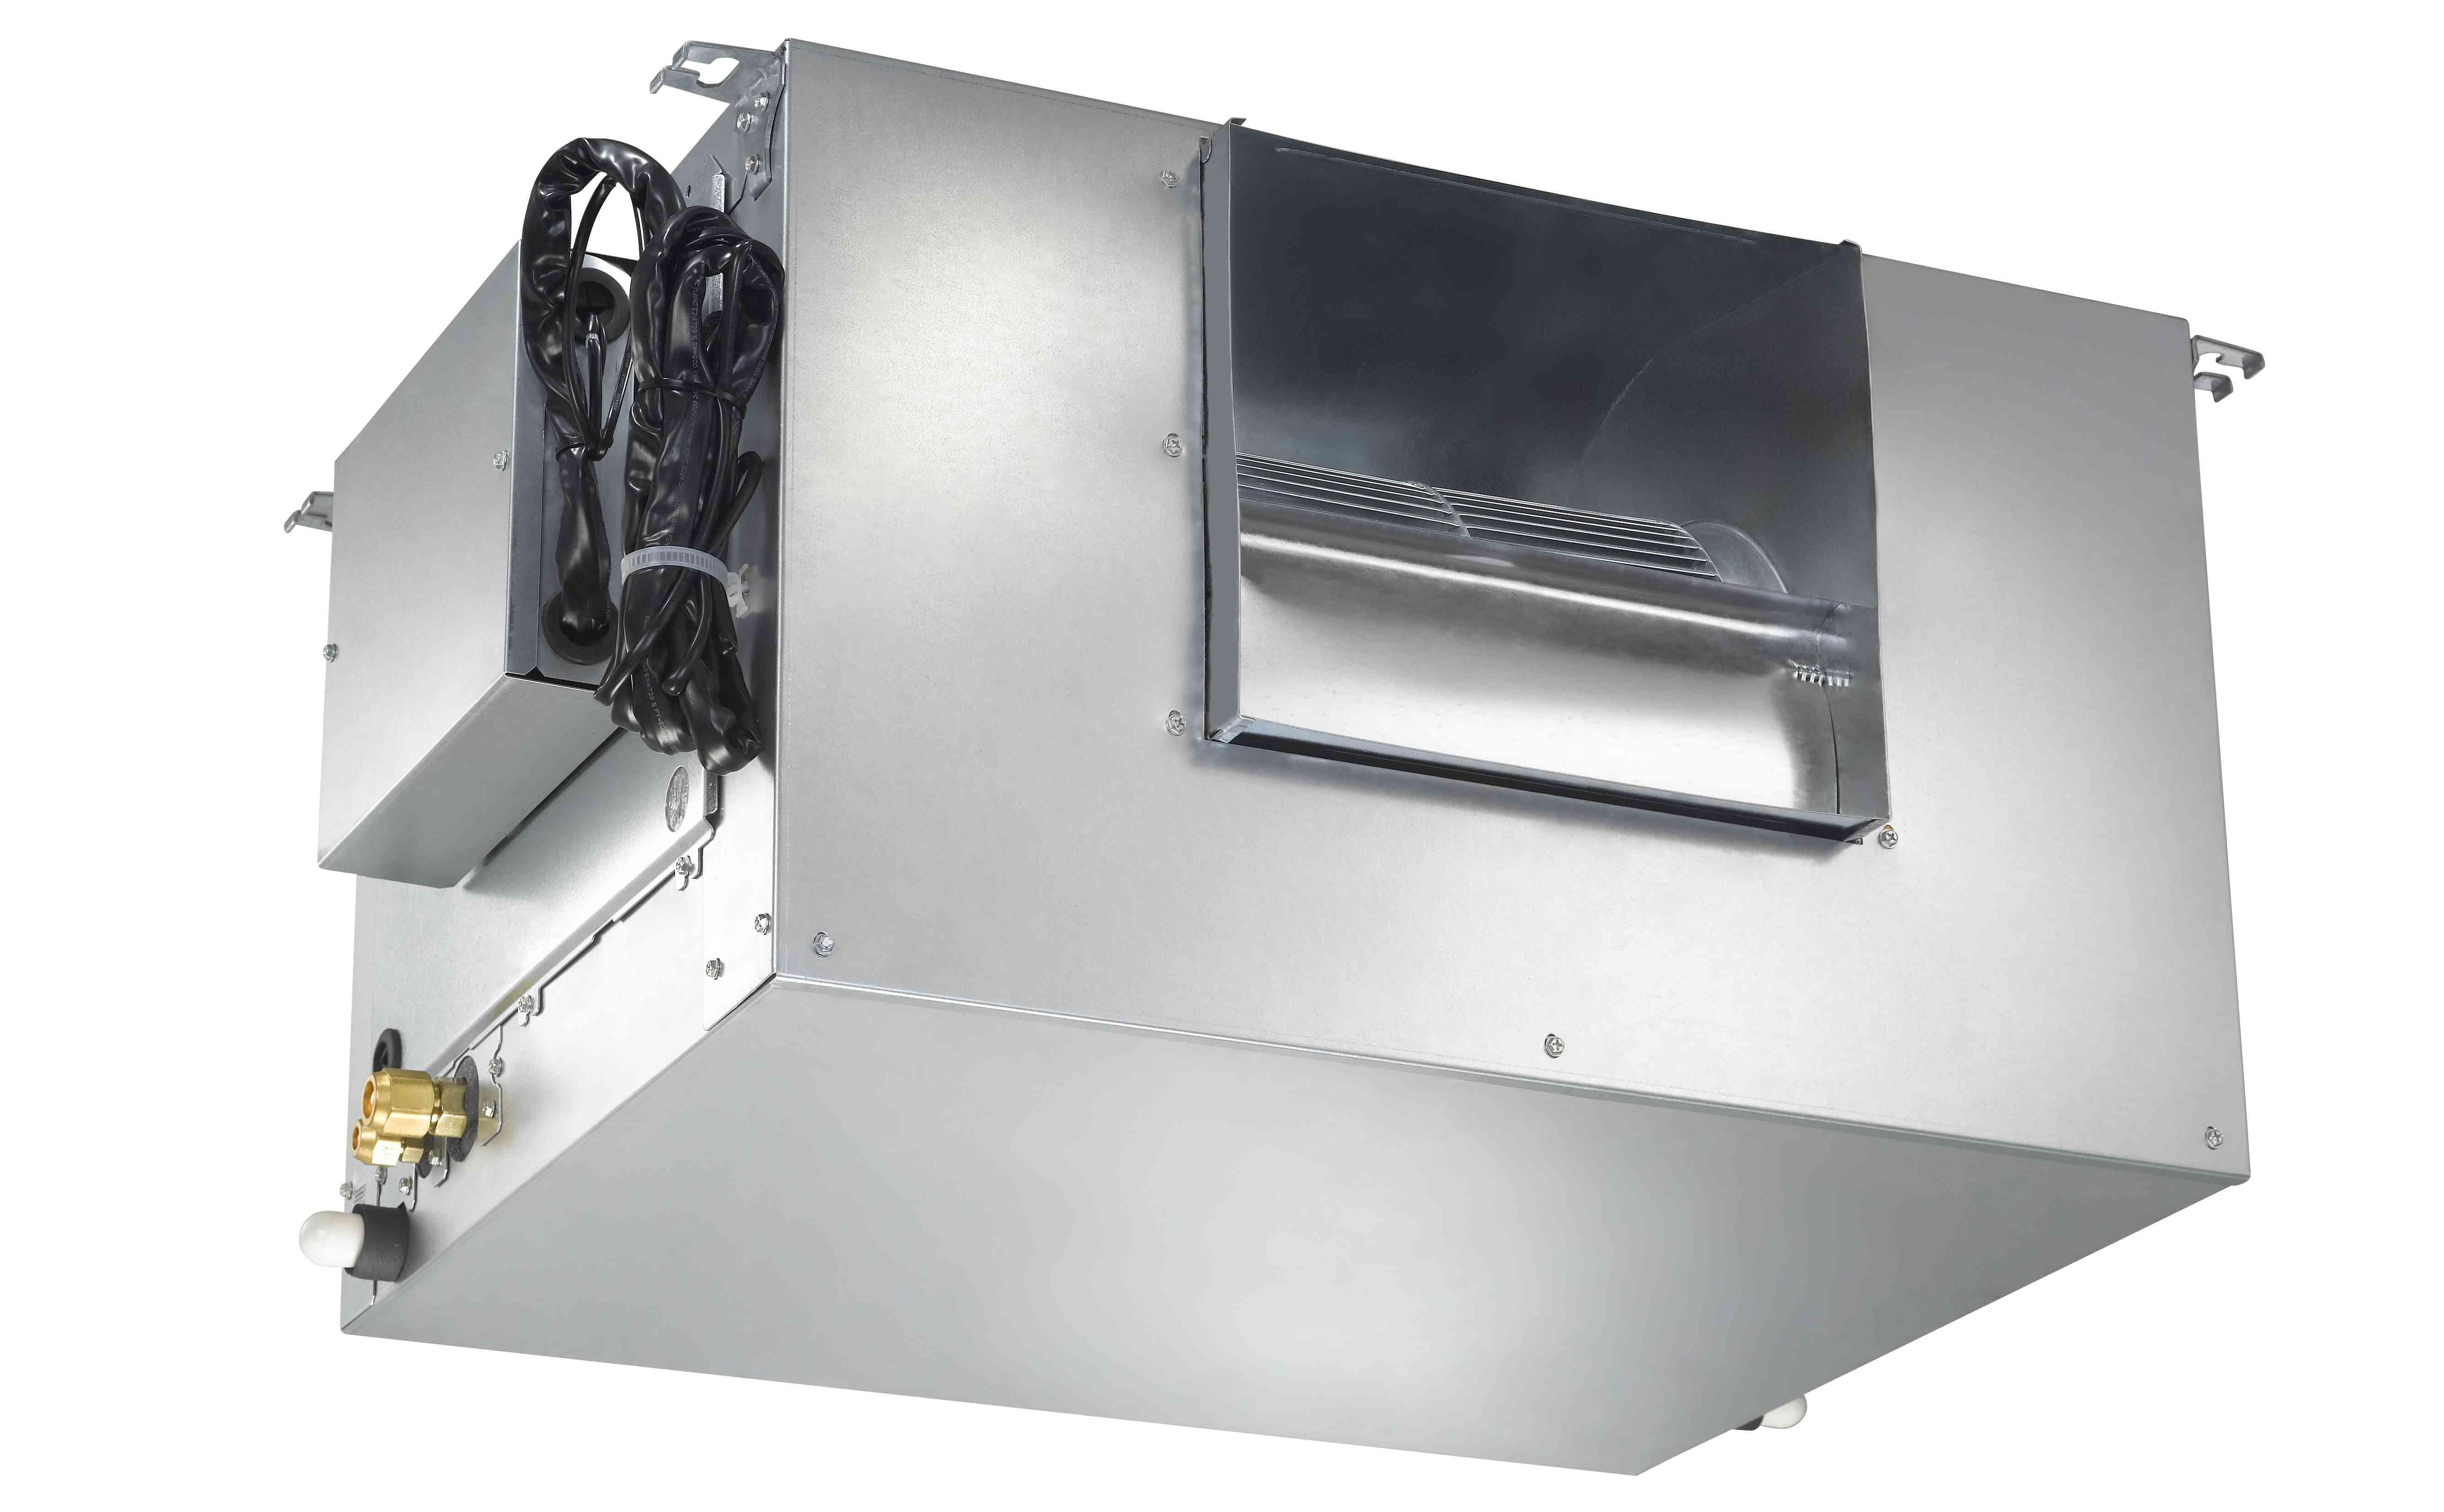 EMD50 electra